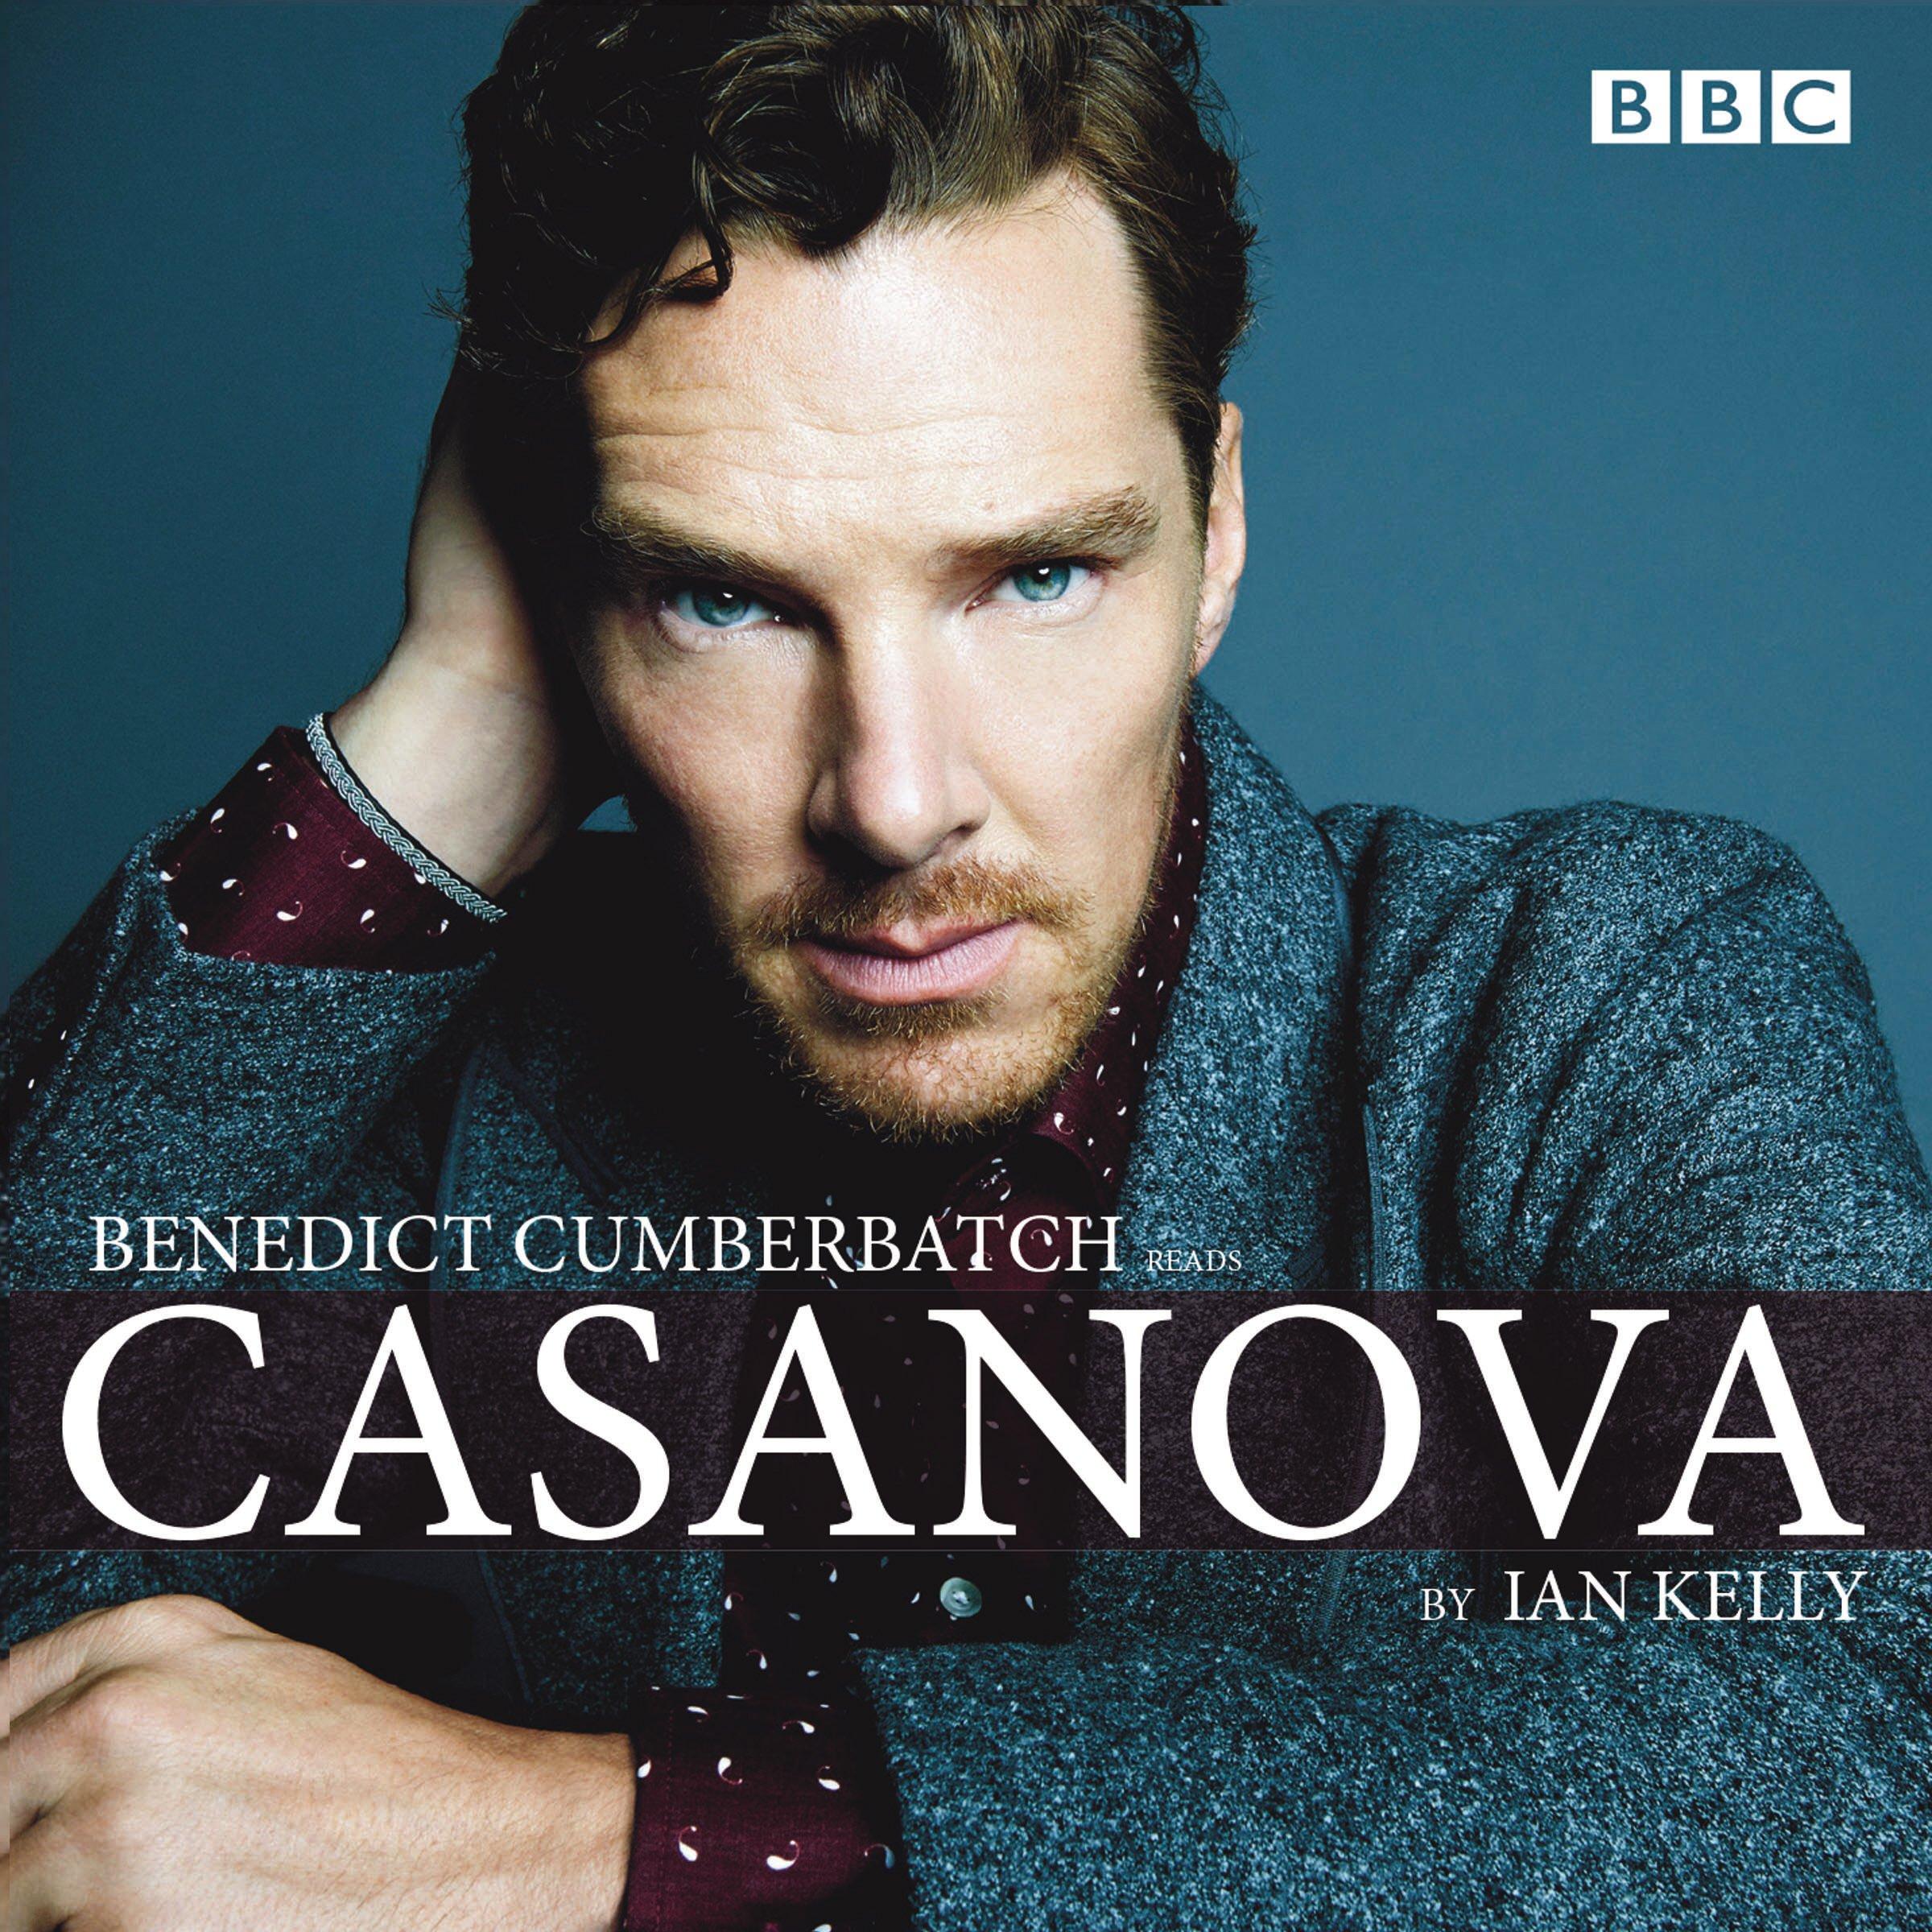 Buy Benedict Cumberbatch reads Ian Kelly's Casanova: A BBC Radio 4 reading  Book Online at Low Prices in India | Benedict Cumberbatch reads Ian Kelly's  ...